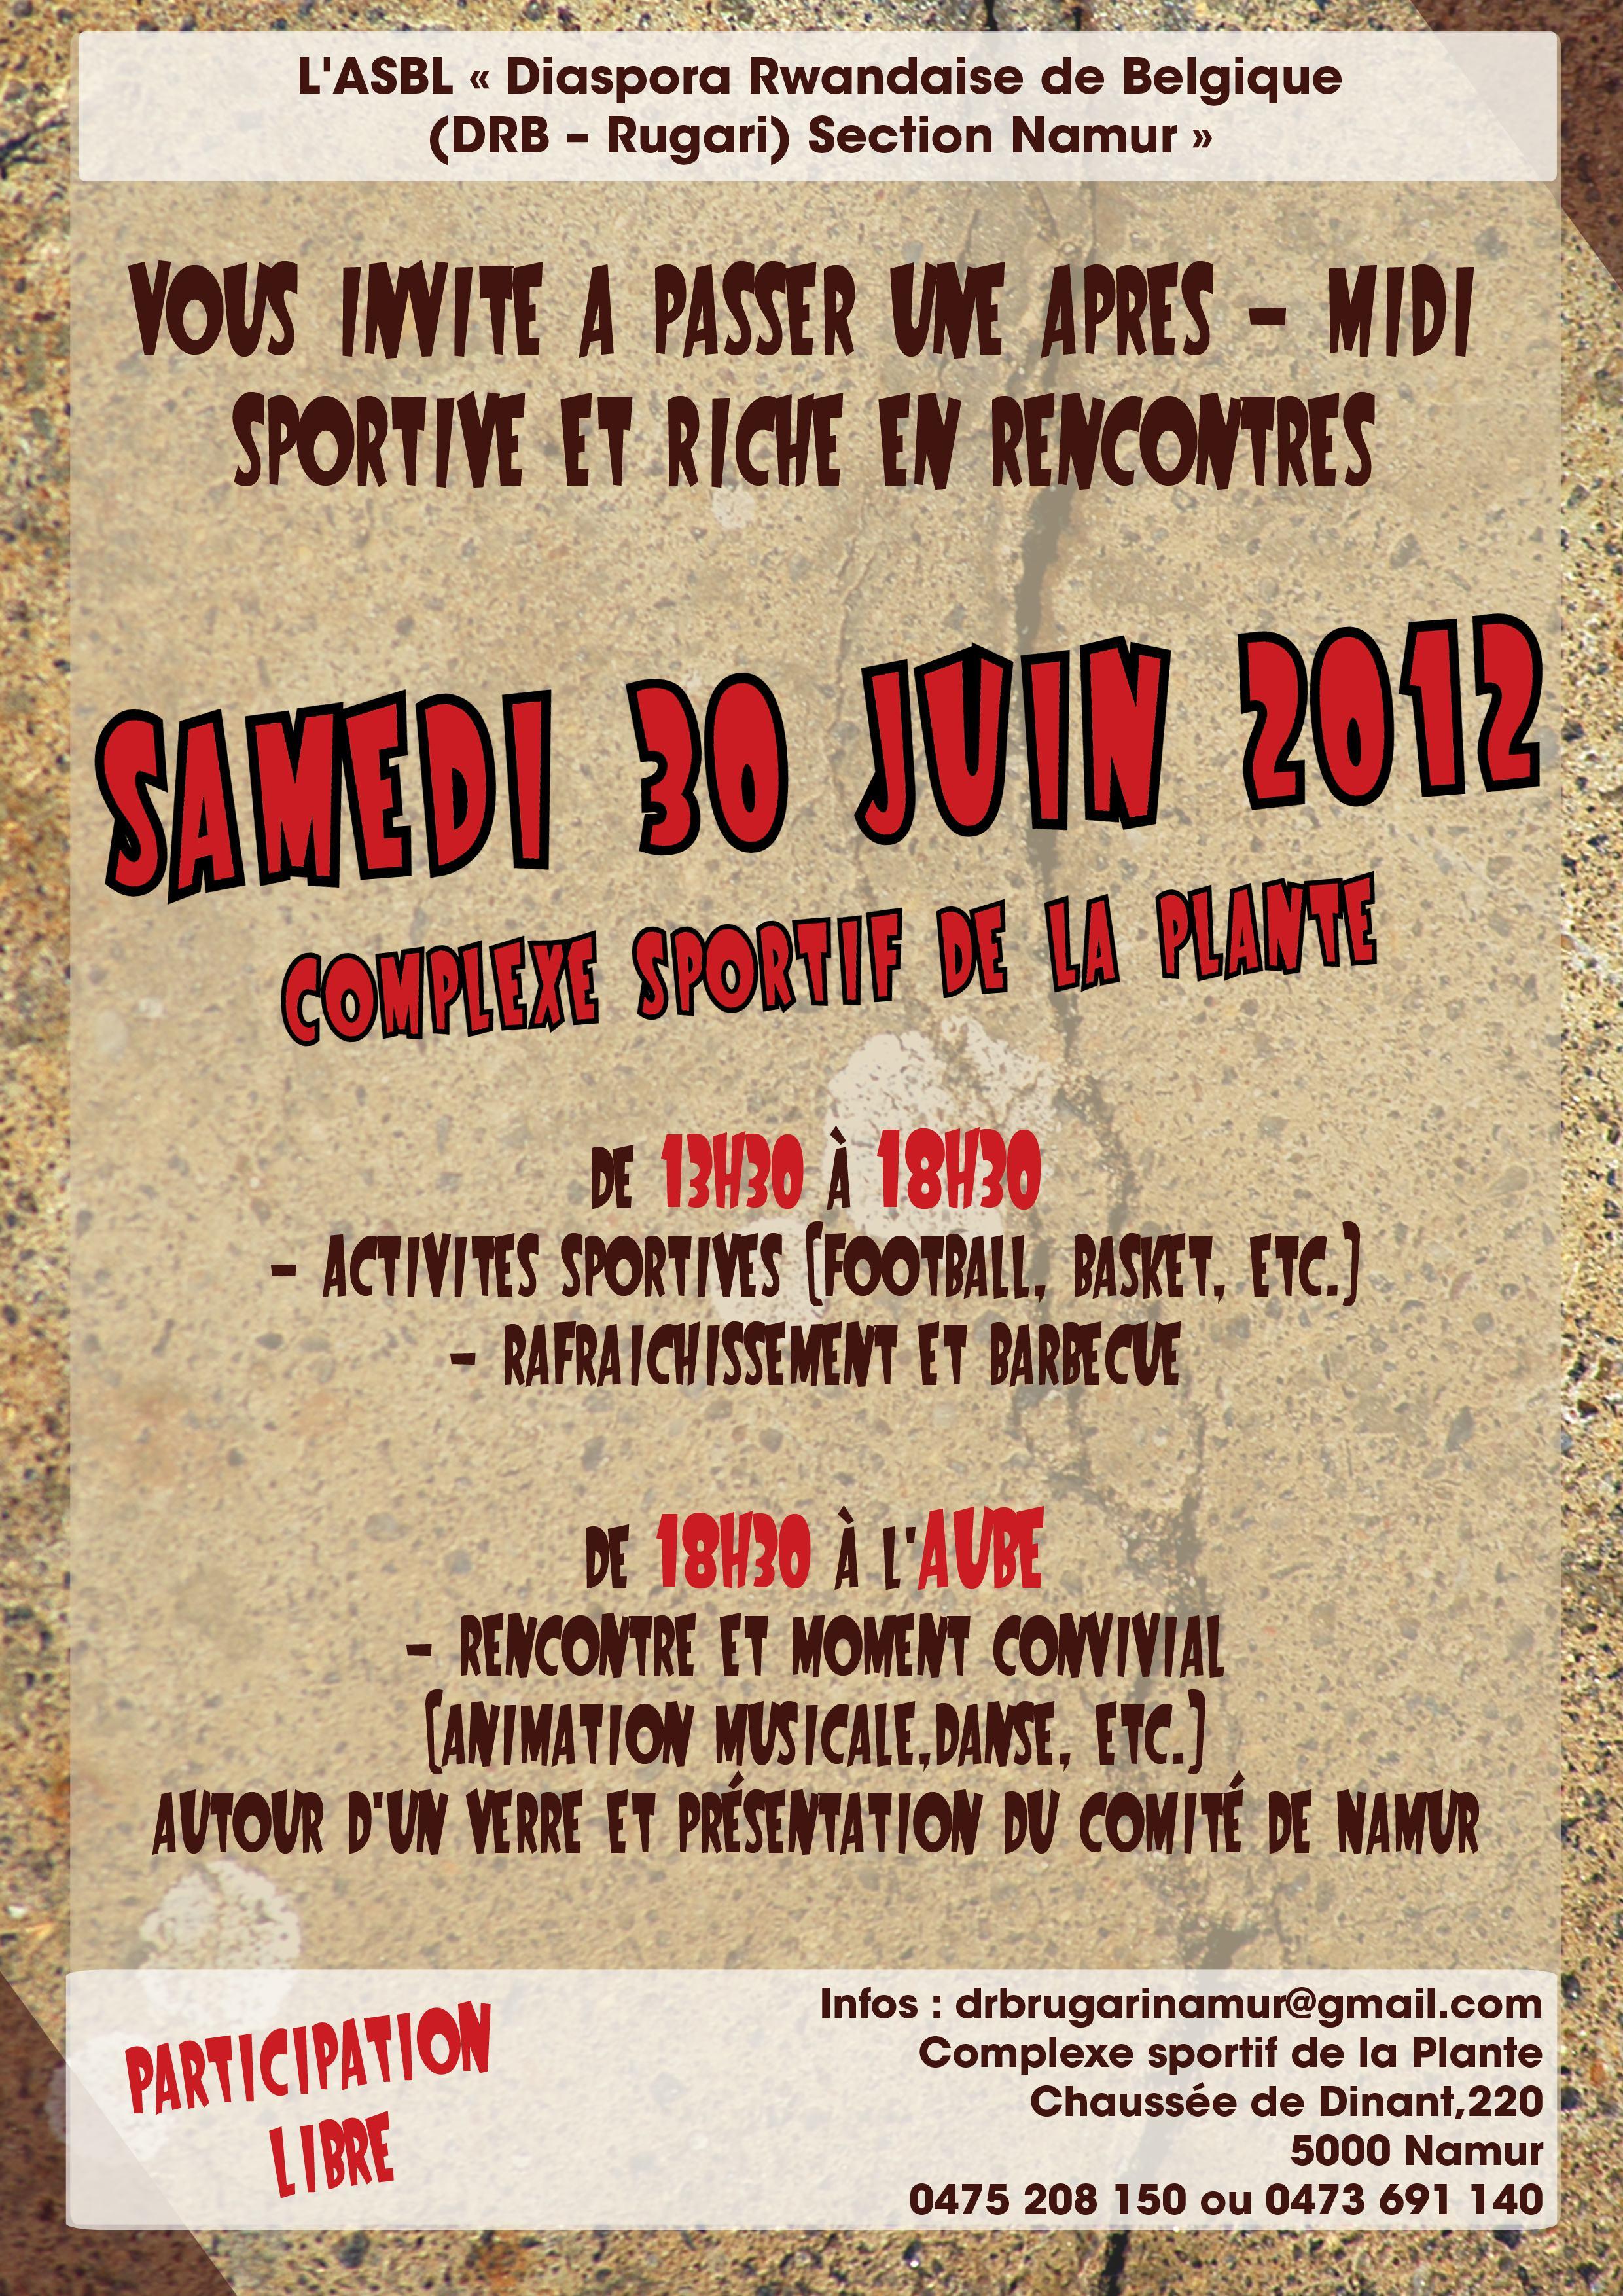 Diaspora : Après-midi sportive à Namur le 30 juin 2012